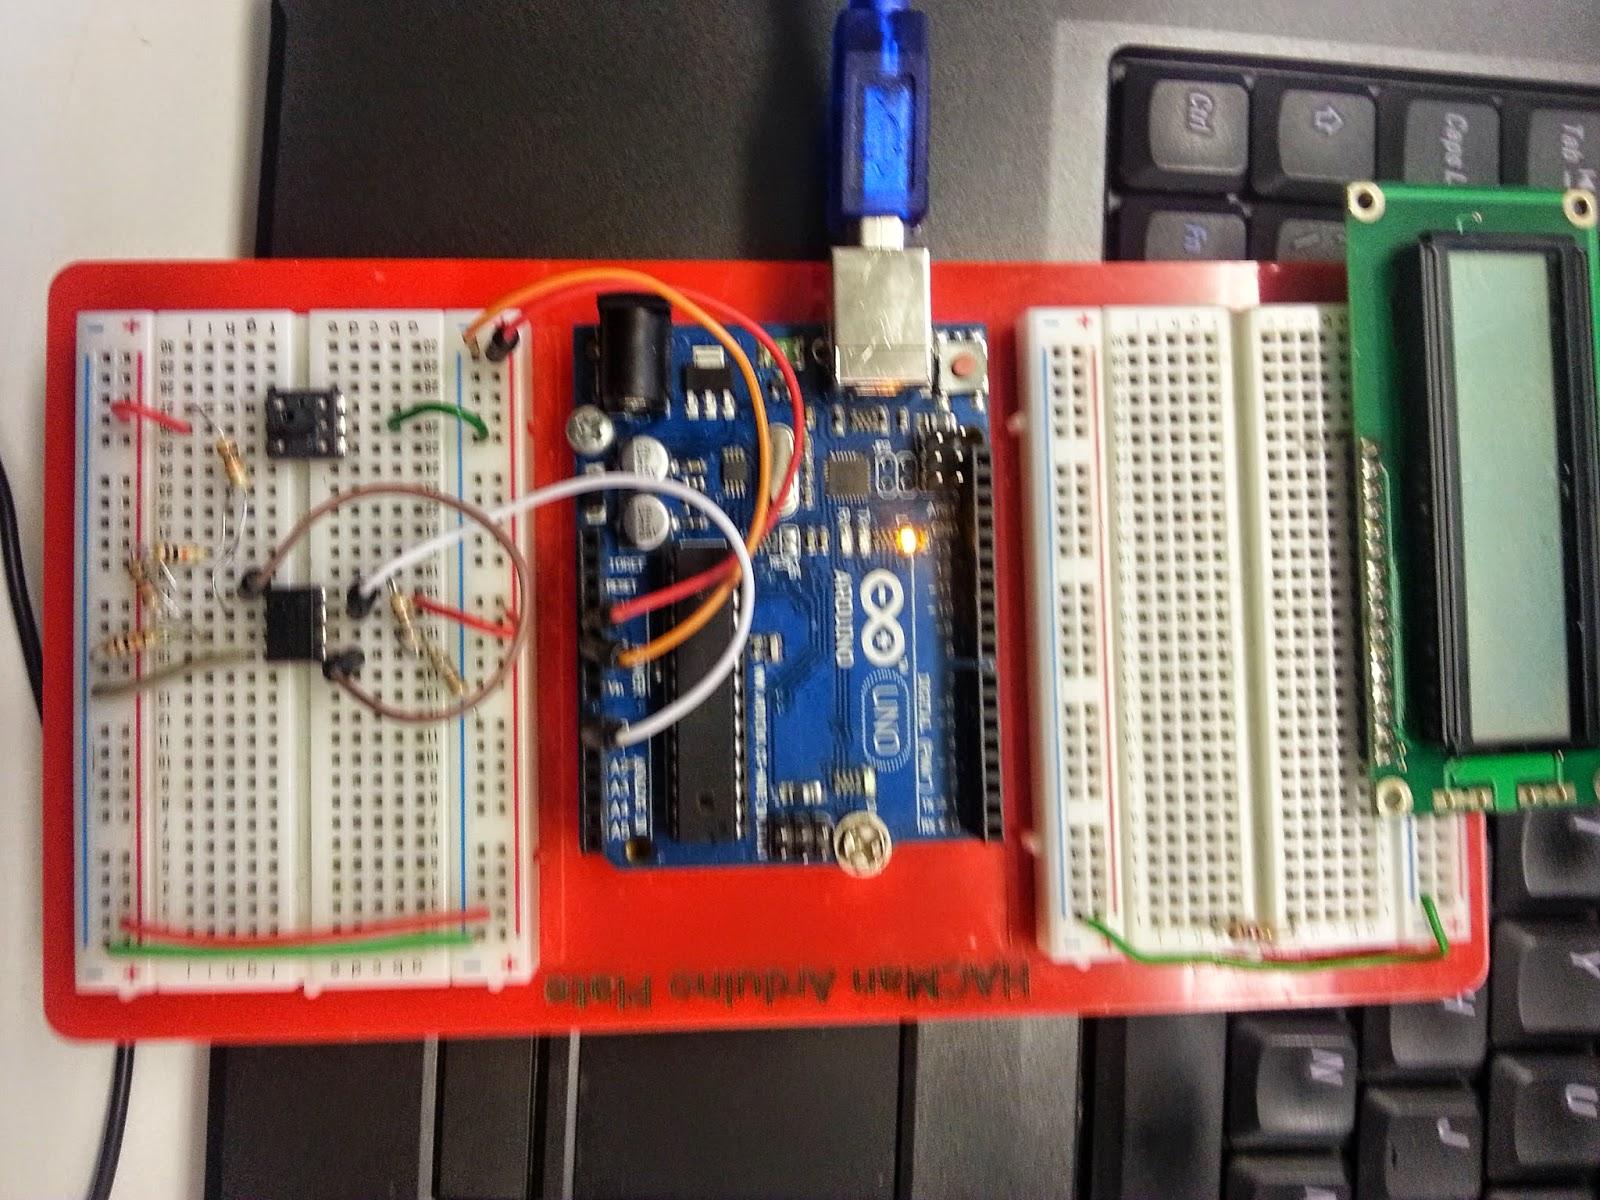 WRG-7511] Arduino Pressure Sensor Wiring Diagram